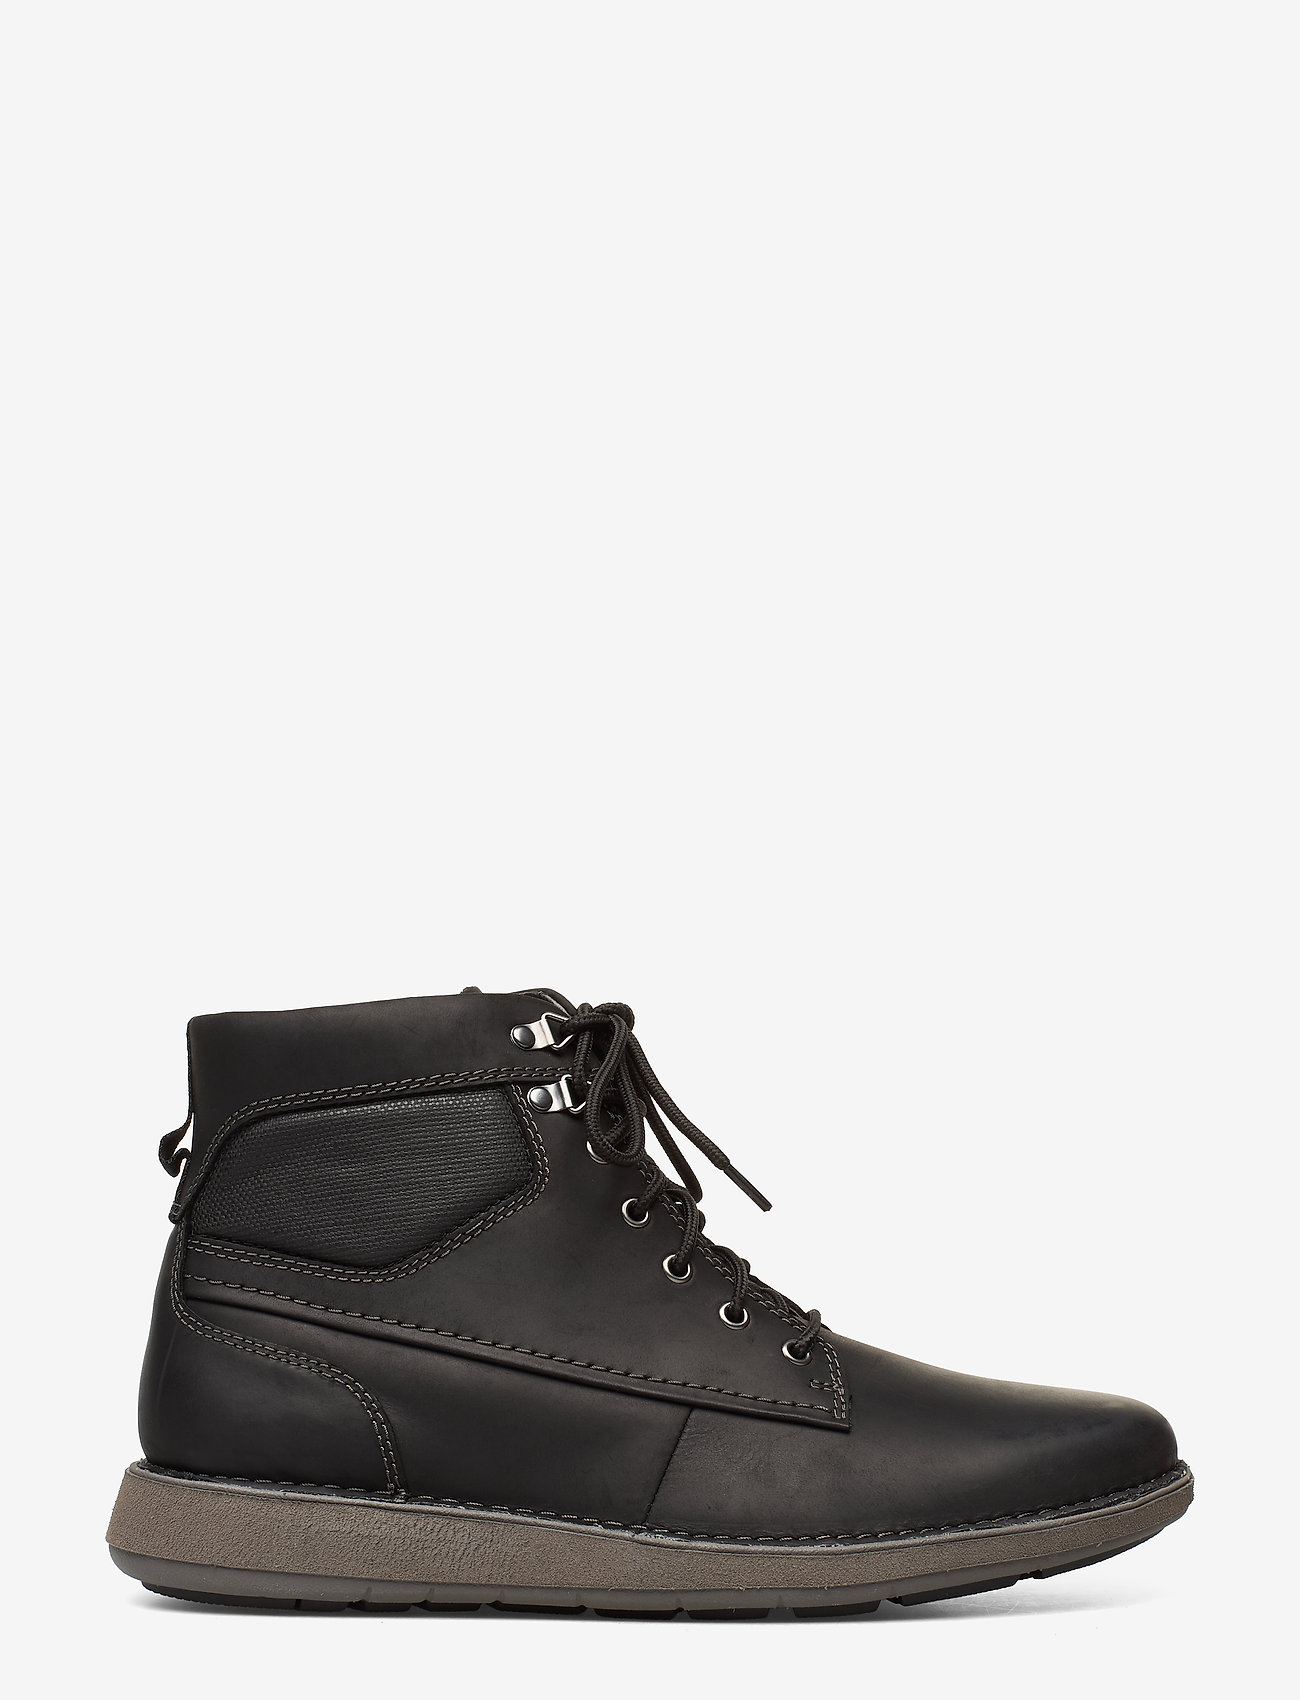 Un Larvik Peak (Black Leather) (78 €) - Clarks ETHZh